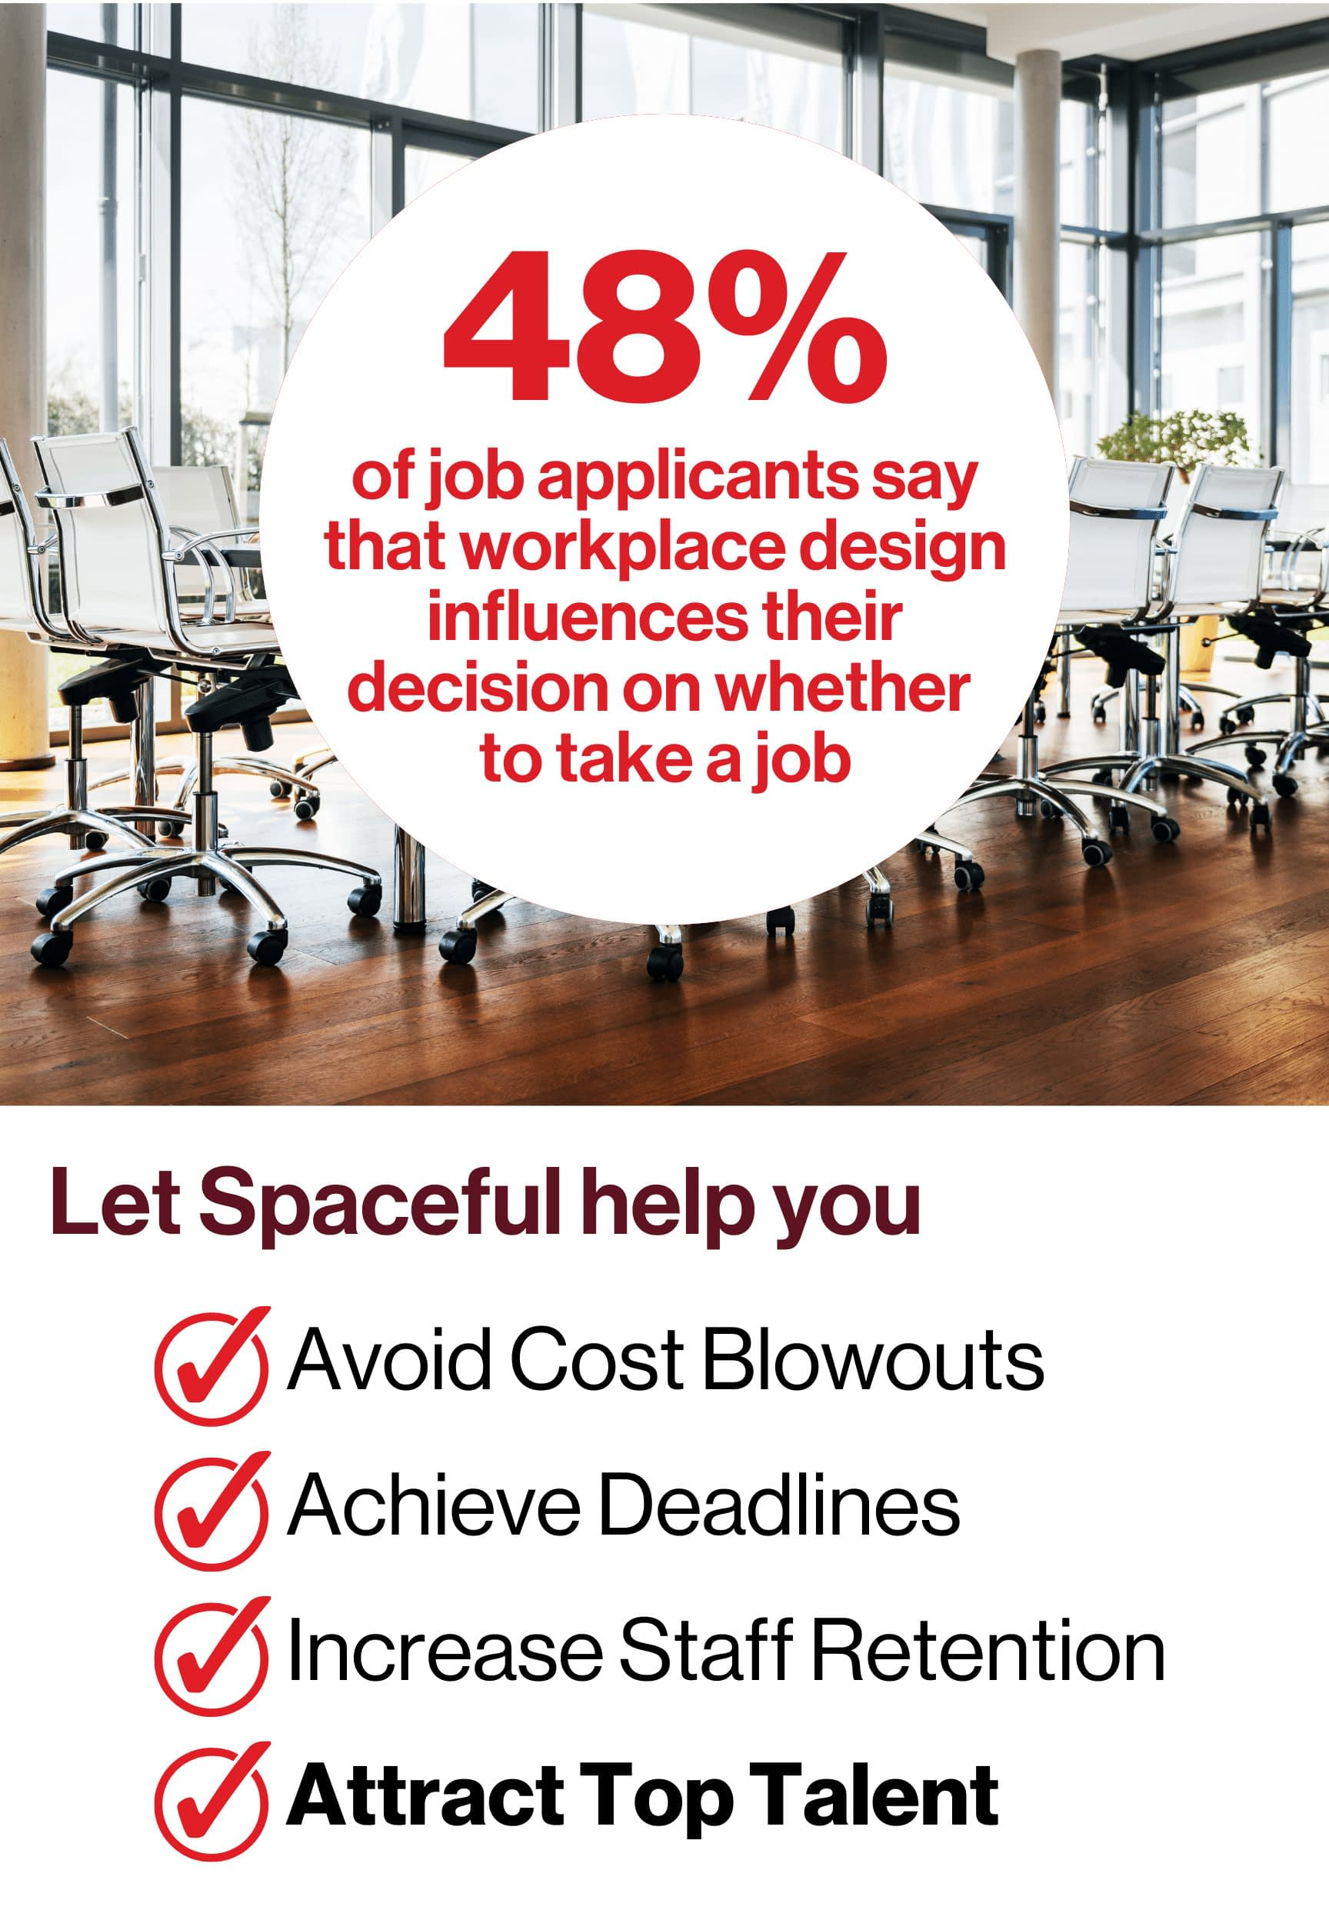 Increase Staff Retention (2)